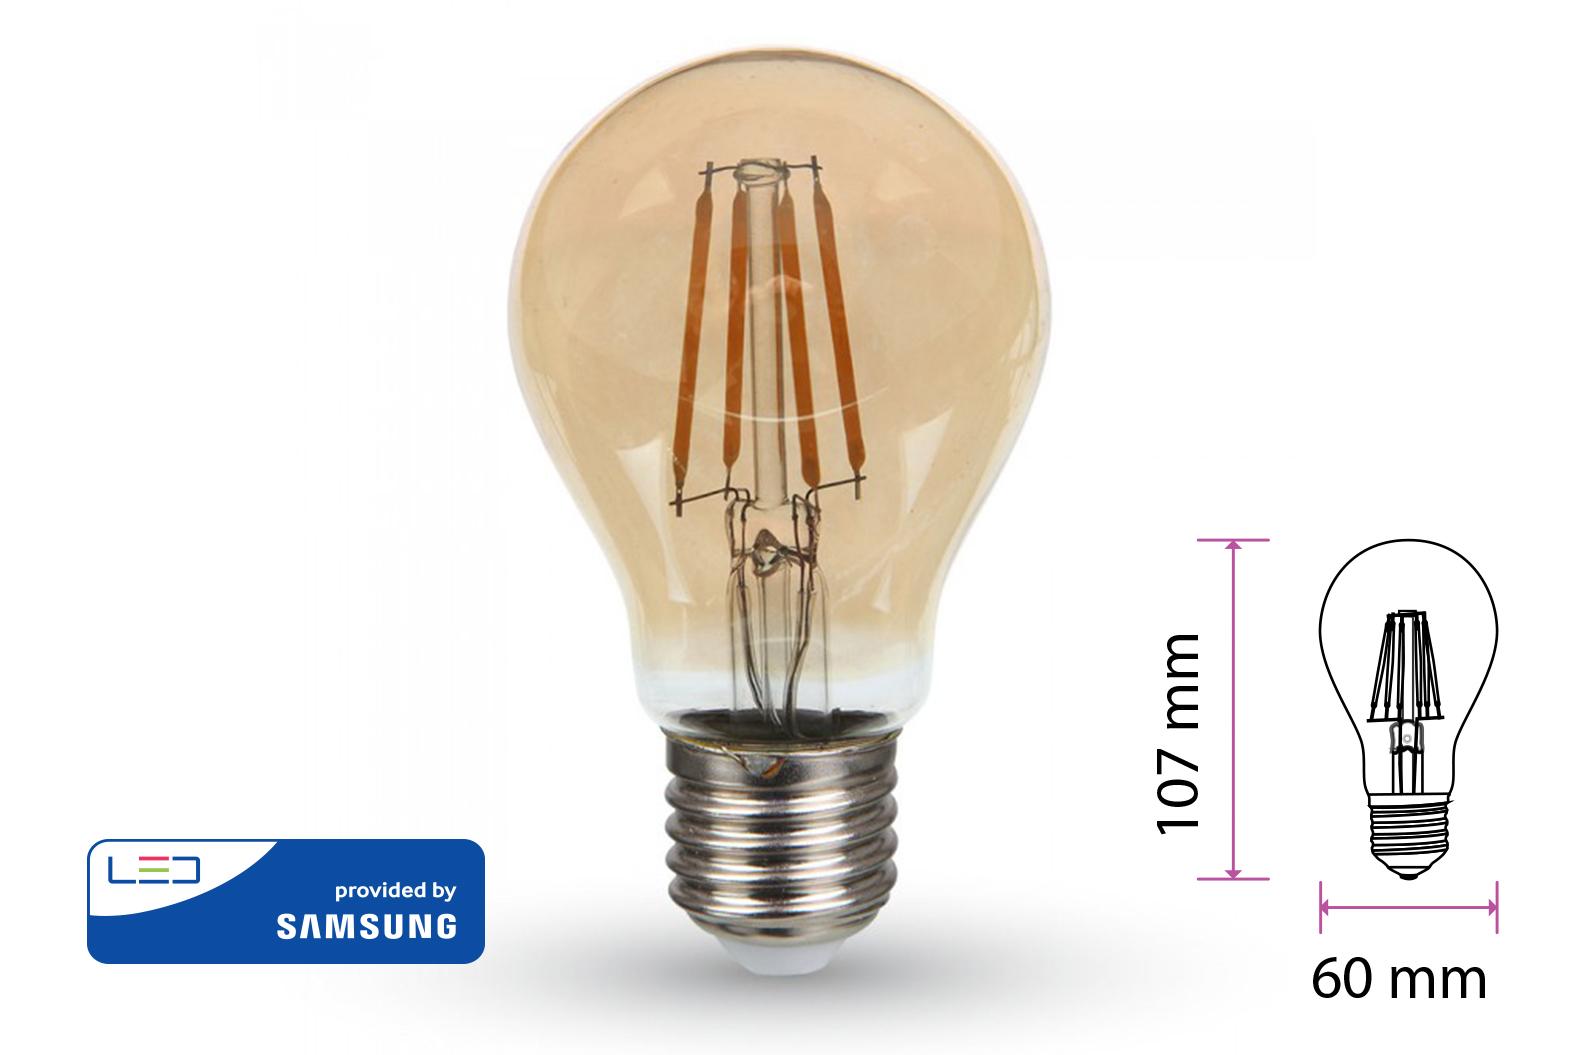 Lampada Filo Led a Filamento E27 4W A60 Bianco Caldo 2200K Cover Amber Led Samsung Garanzia 5 Anni SKU-282 - PZ